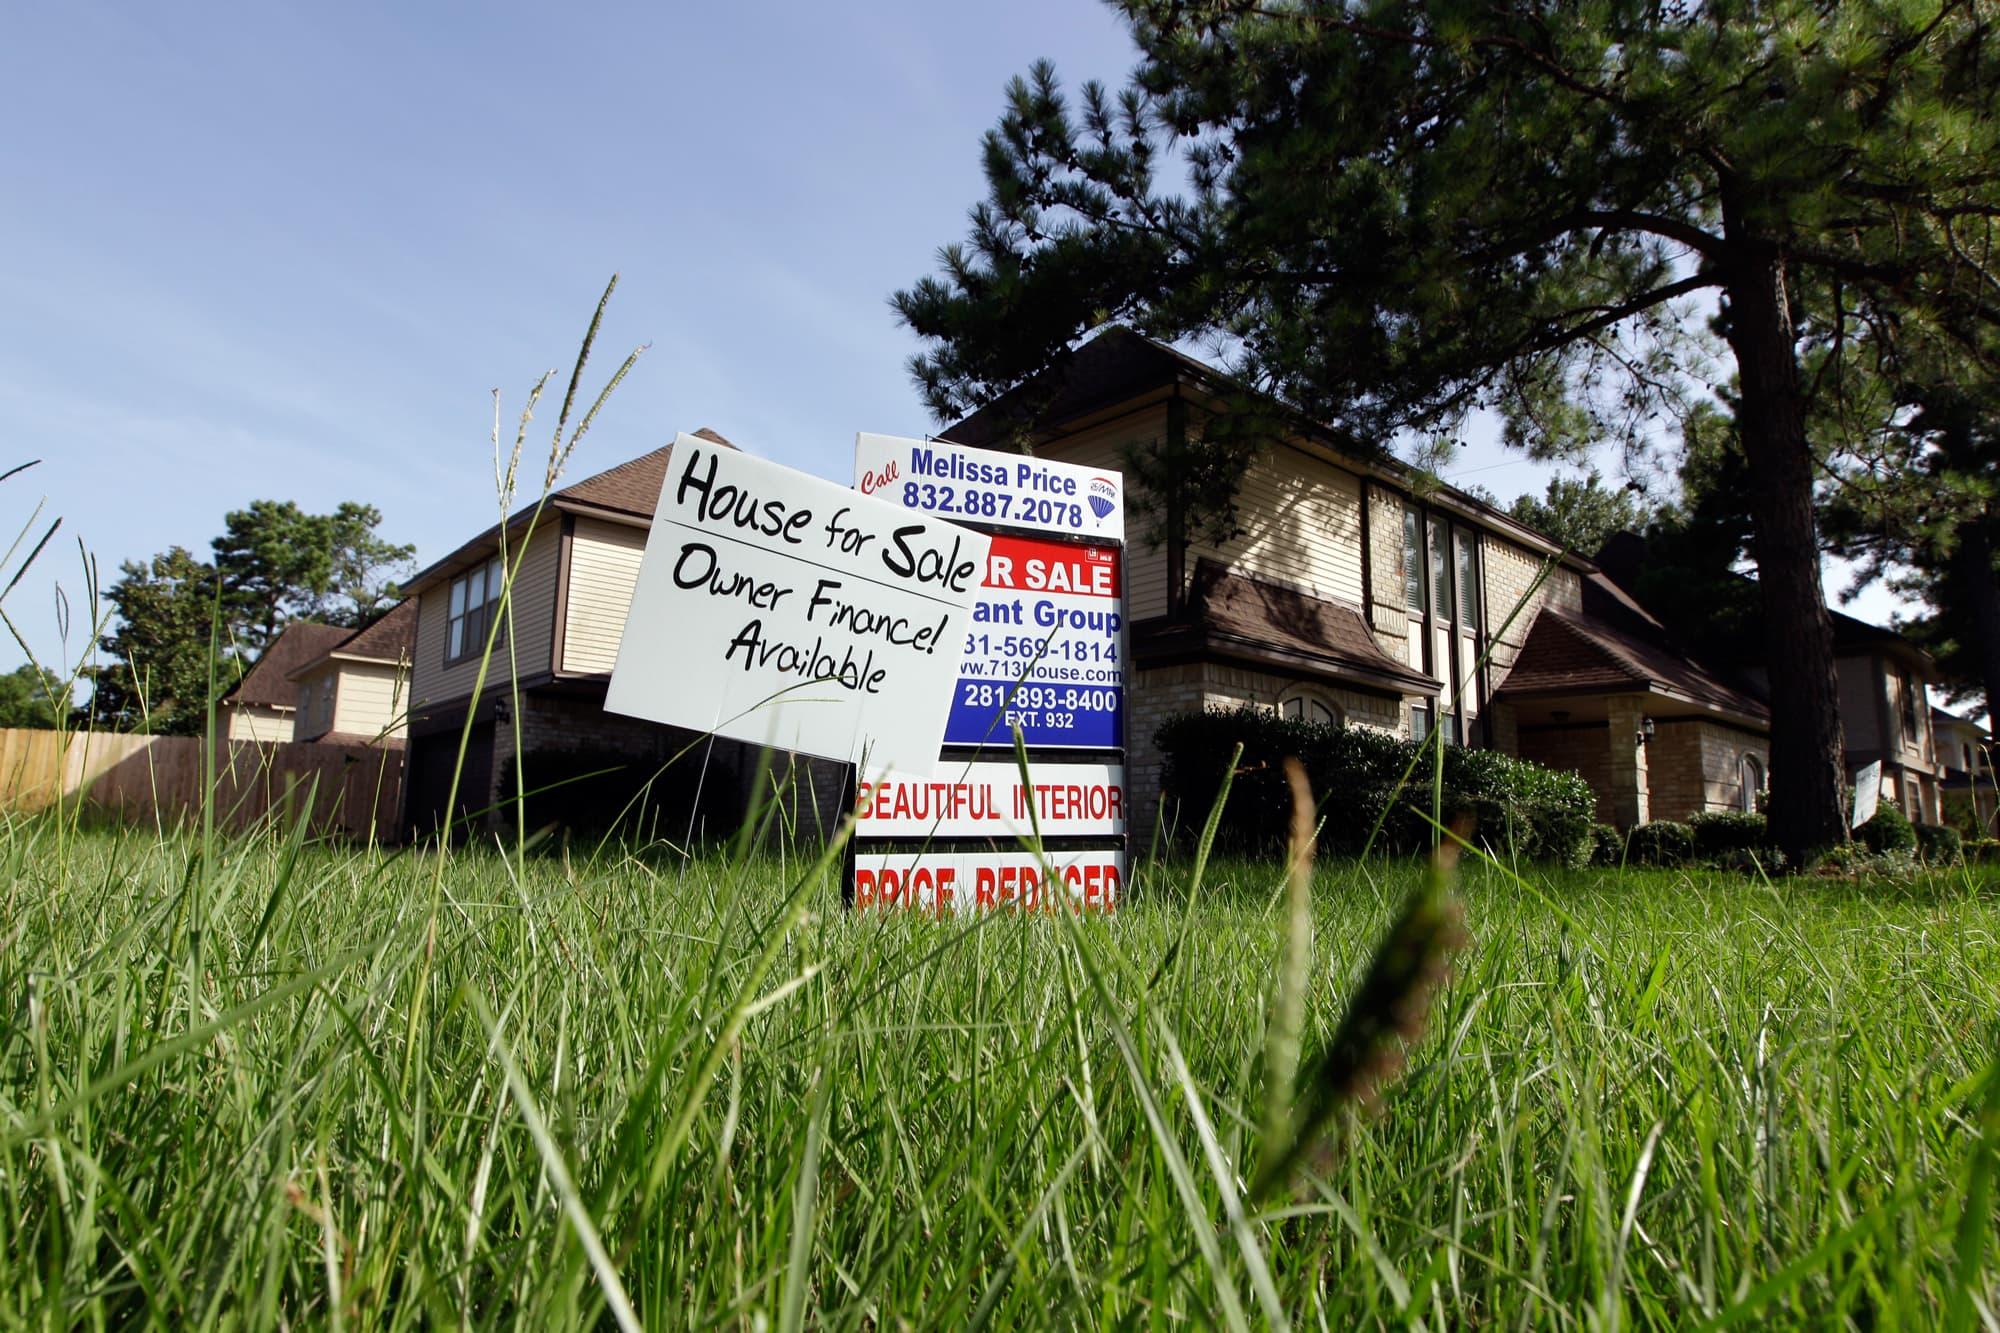 Houston housing awaits spring chill